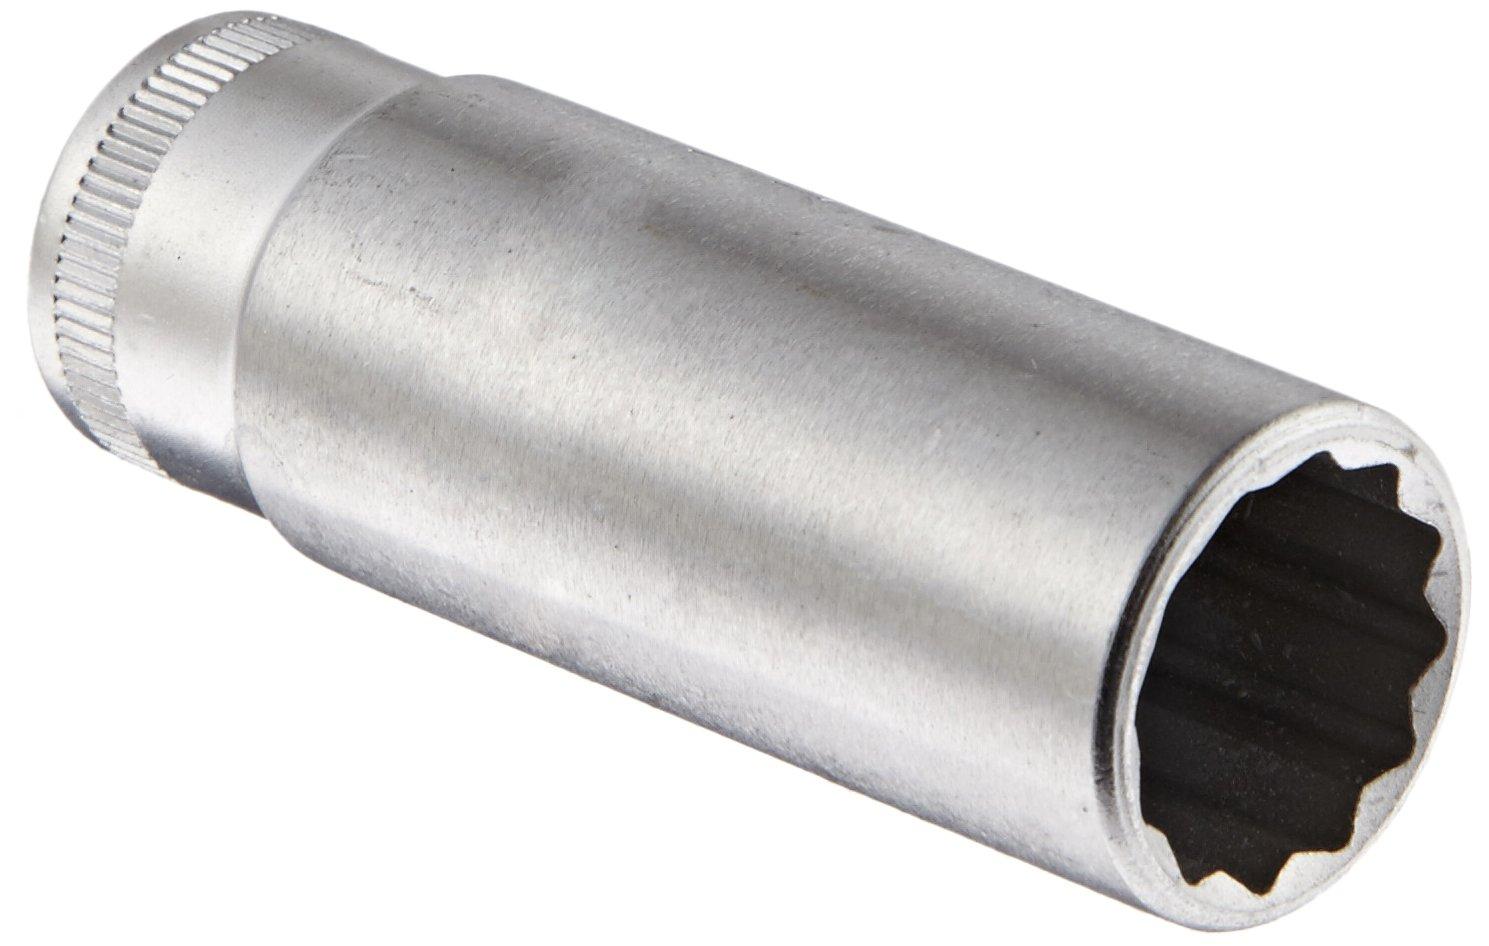 Stahlwille 46-15 Steel Extra Deep Bi-Hexagon Socket, 3/8'' Drive, 12 Points, 15mm Diameter, 60mm Length, 20.6mm Width